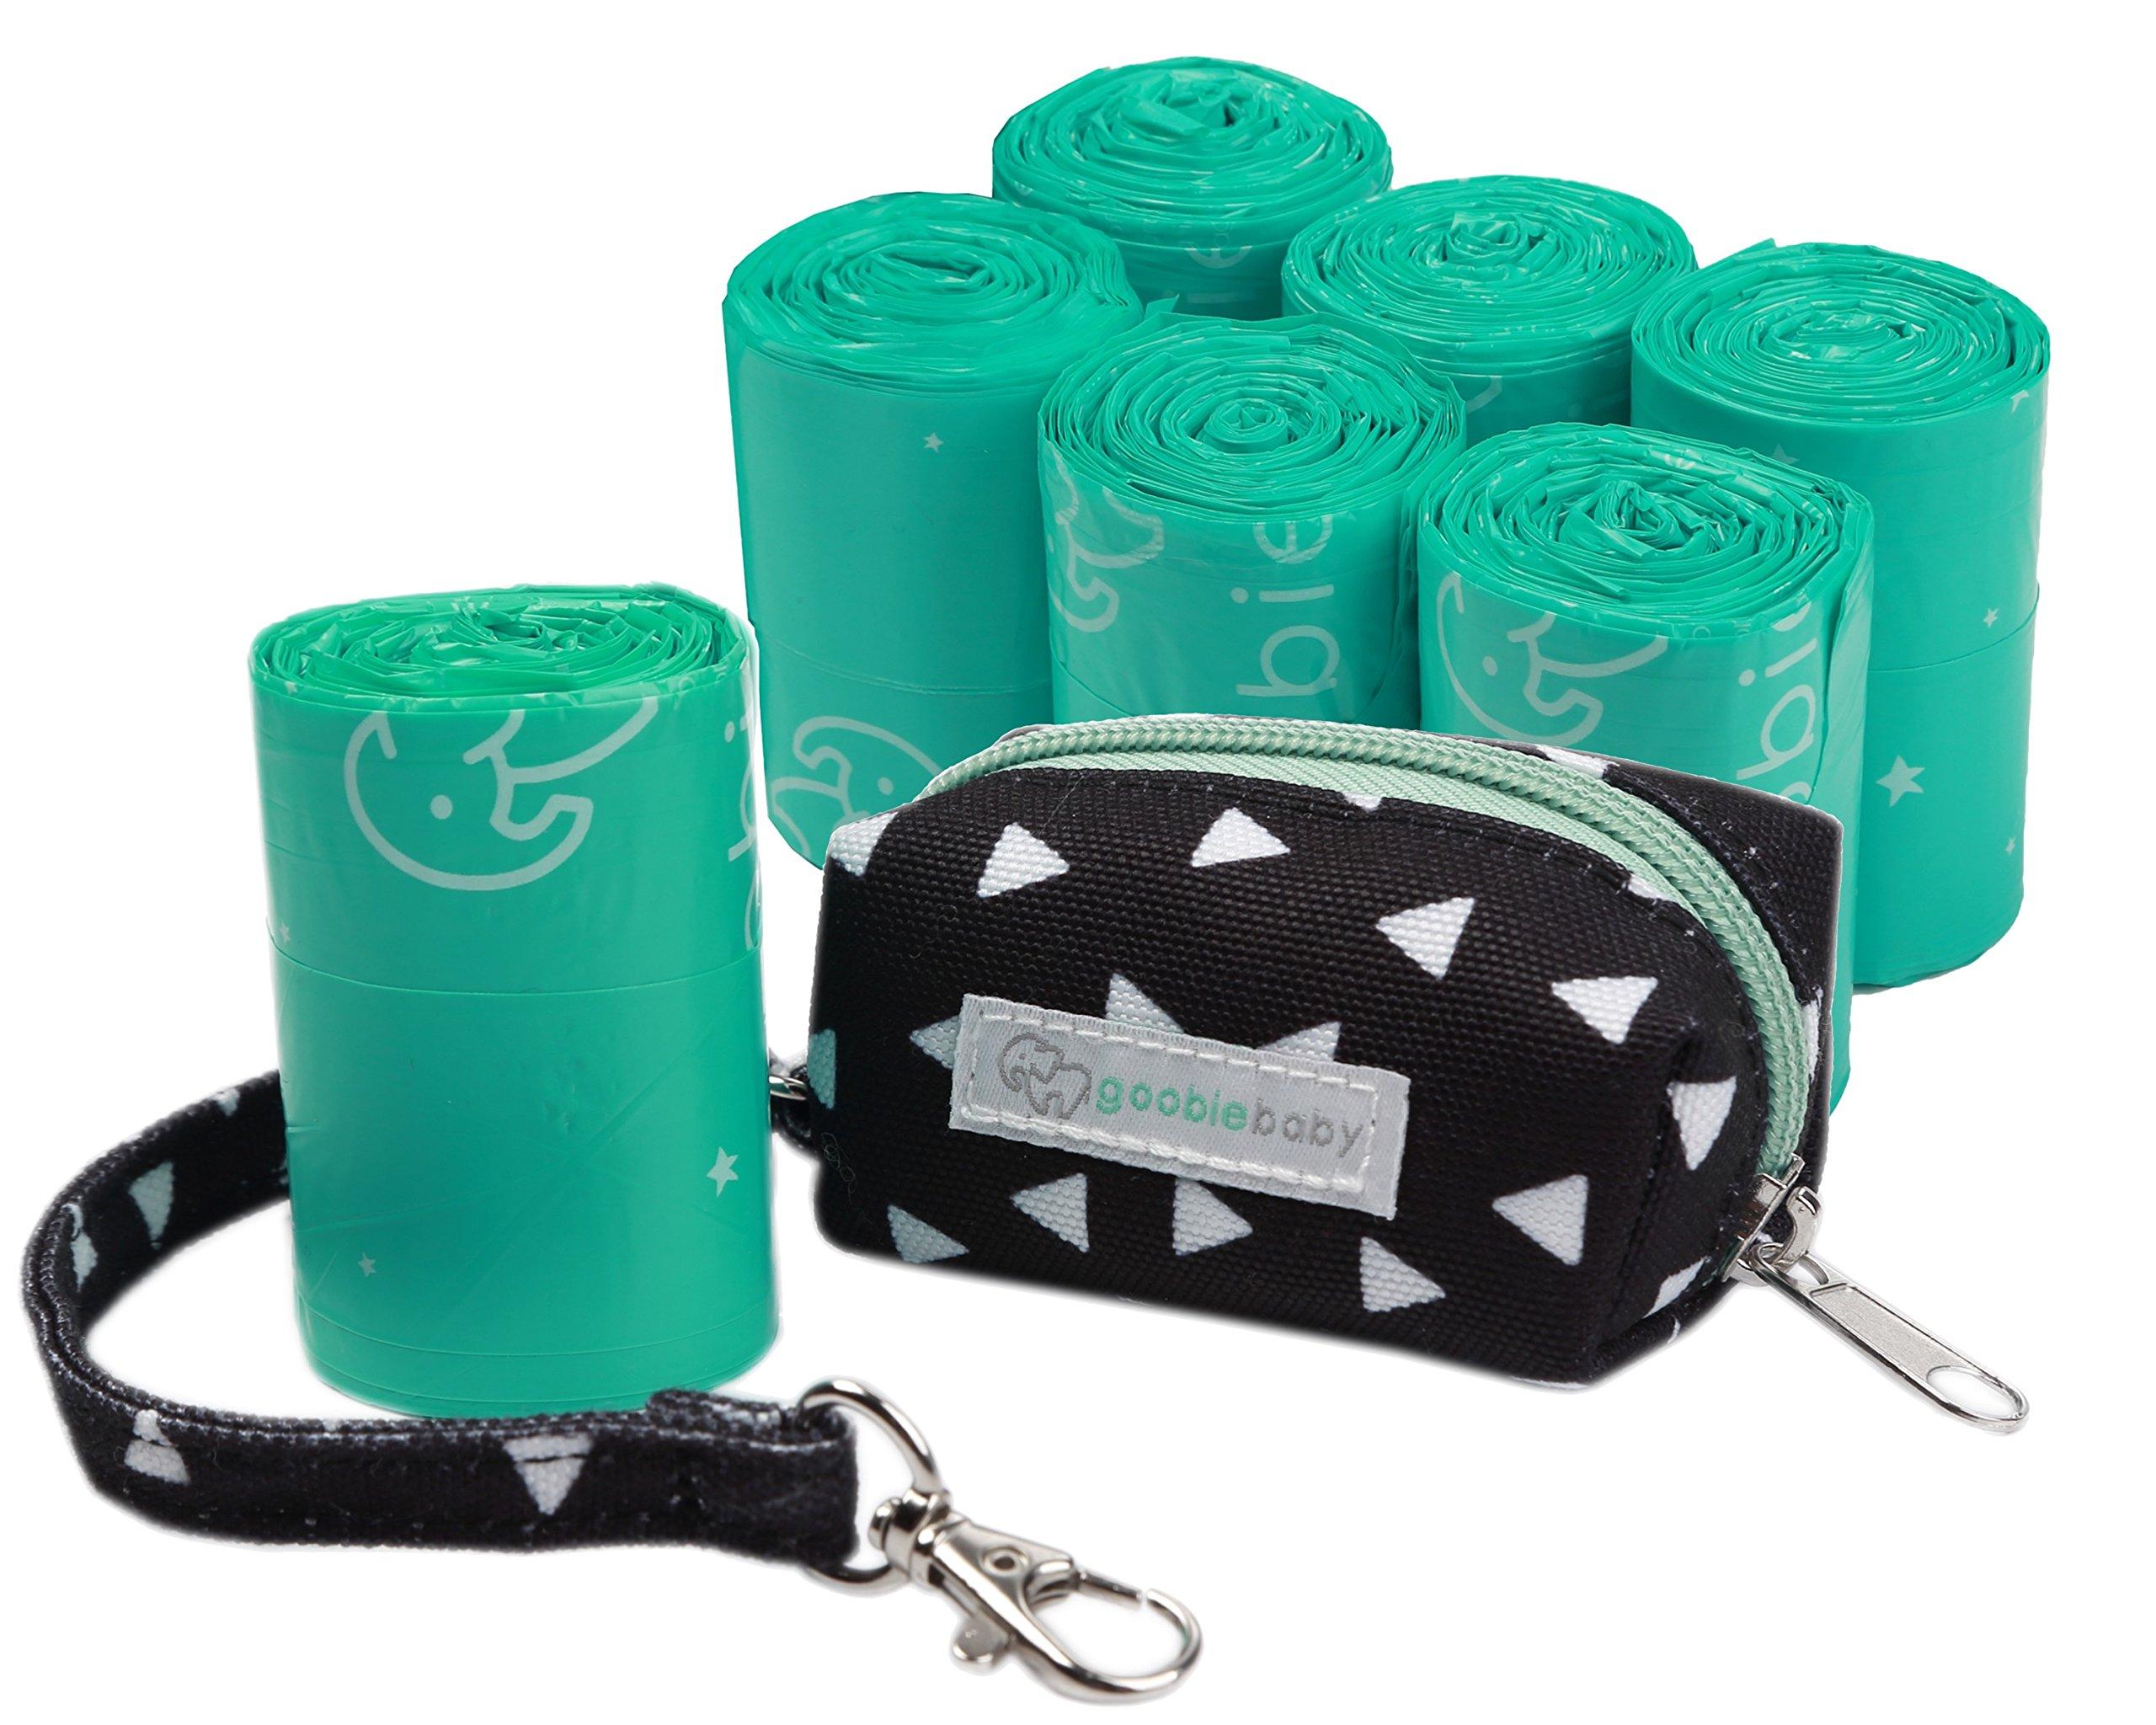 Goobie Baby Diaper Bag Dispenser, Includes Roll of Unscented Disposable Refill Bags | Waste Bag Holder for Stroller (Black Triangle Dispenser + 6 Refill Rolls)